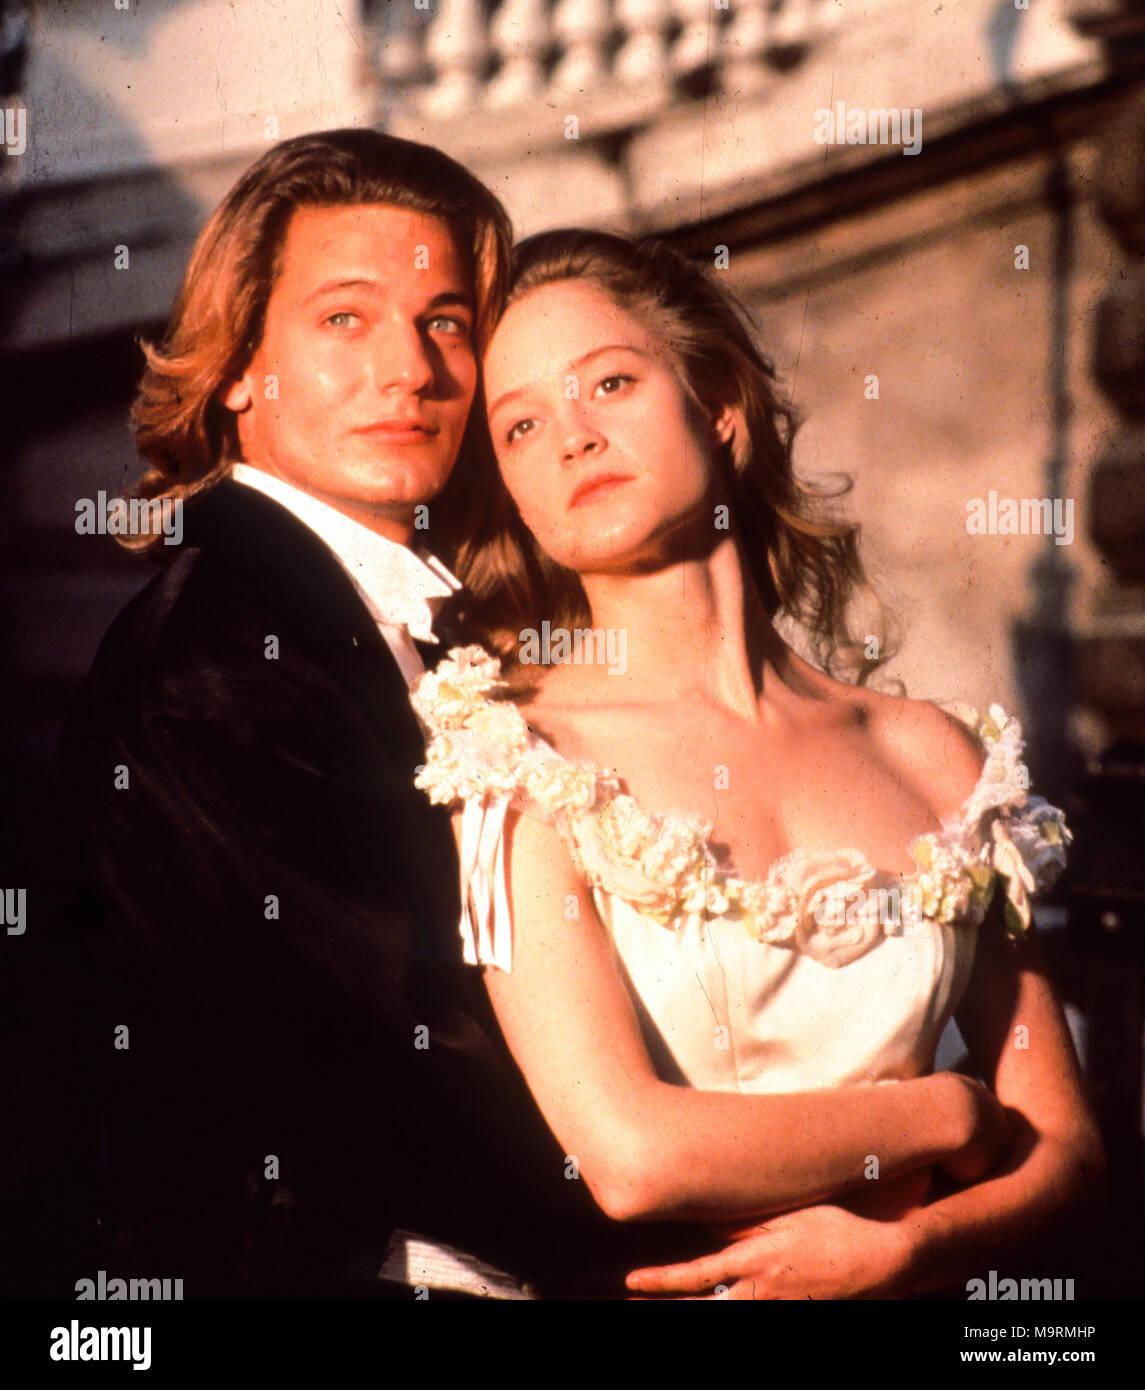 the phantom of the opera, 2004, gerard butler, emmy rossum - Stock Image